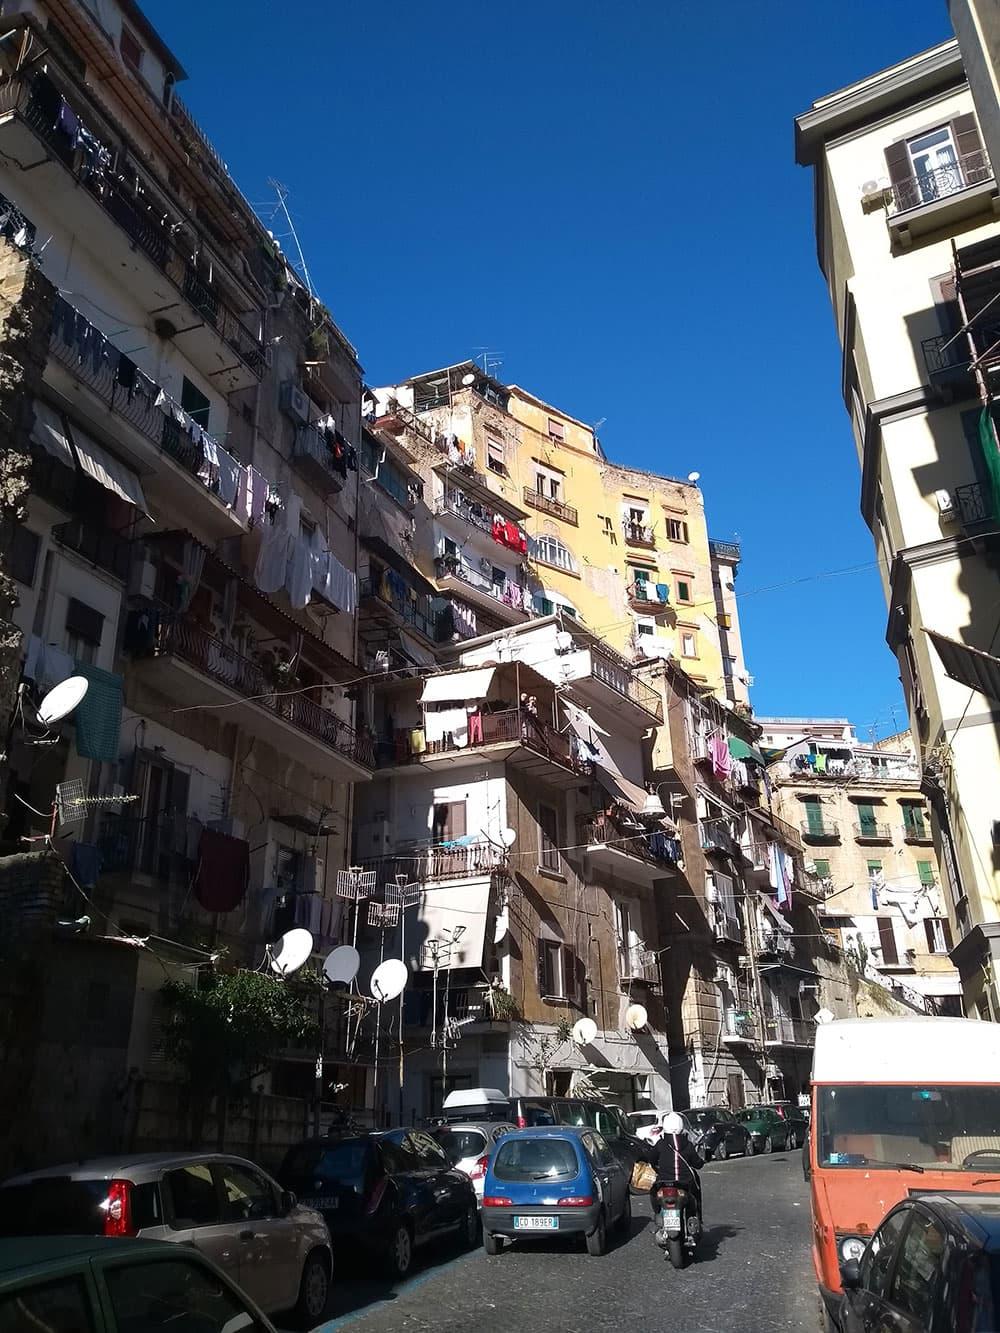 A typical Neapolitan street... washing everywhere!